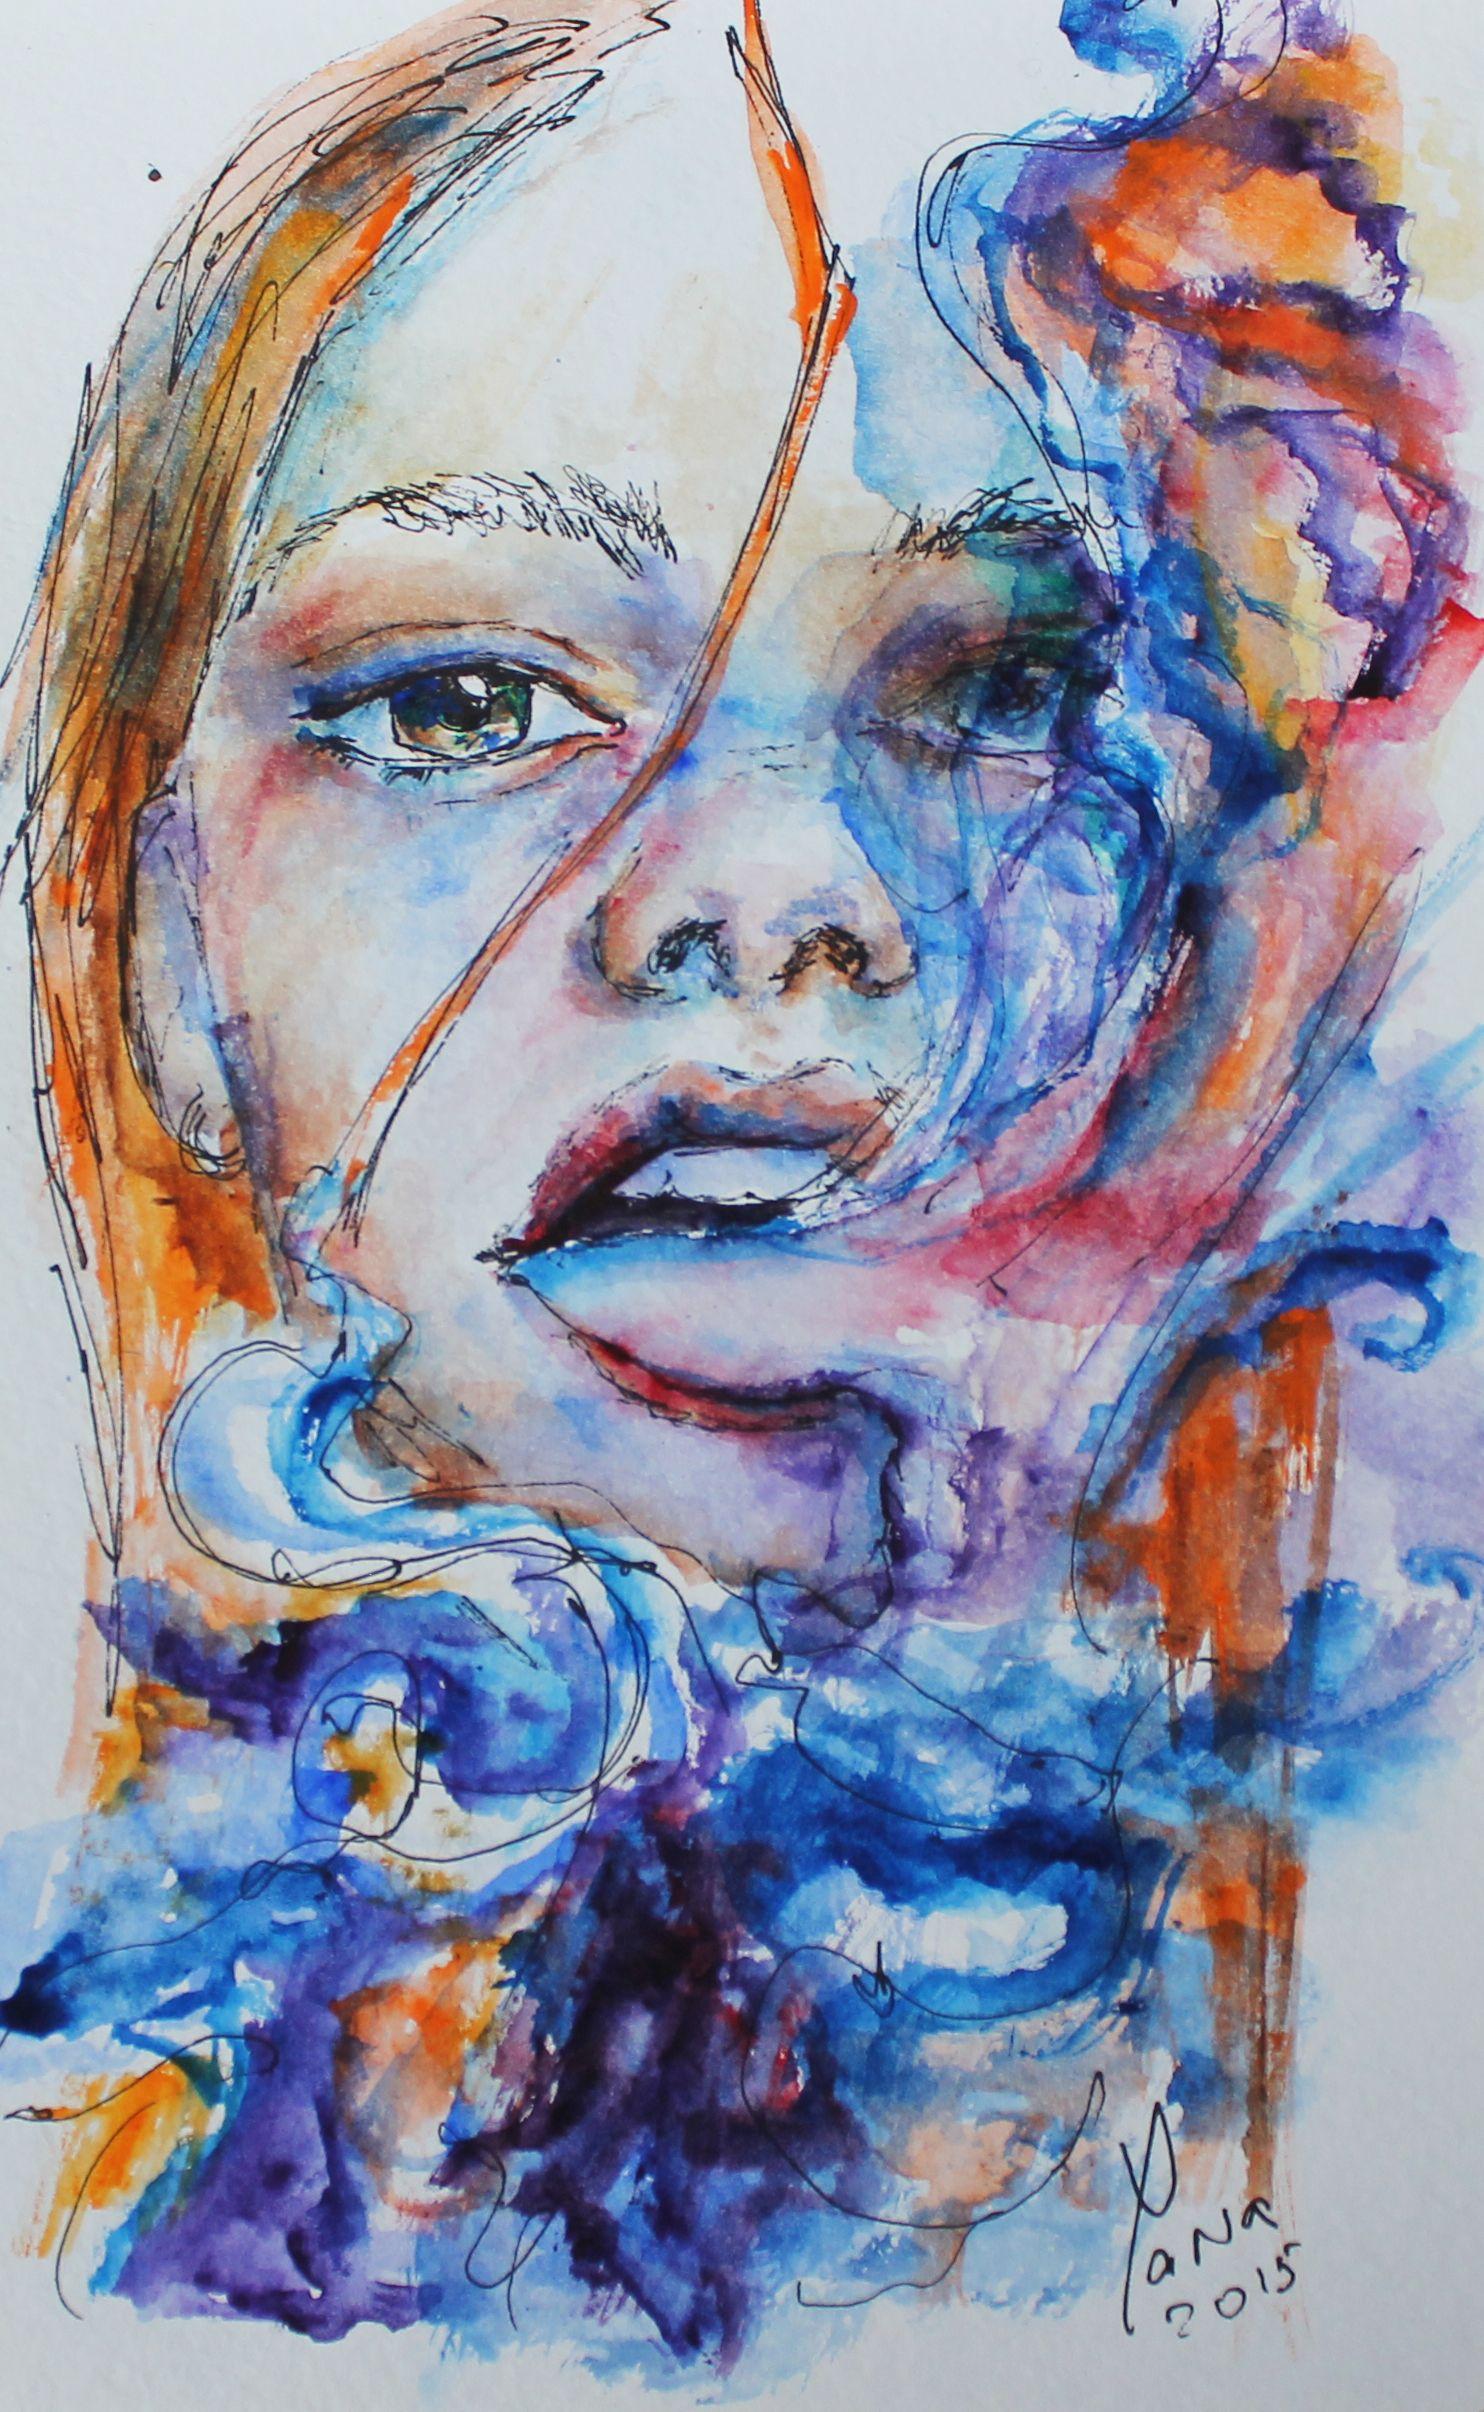 Original watercolor art for sale - Smoking Girl Original Watercolor Painting Available For Sale Small Size Unframed